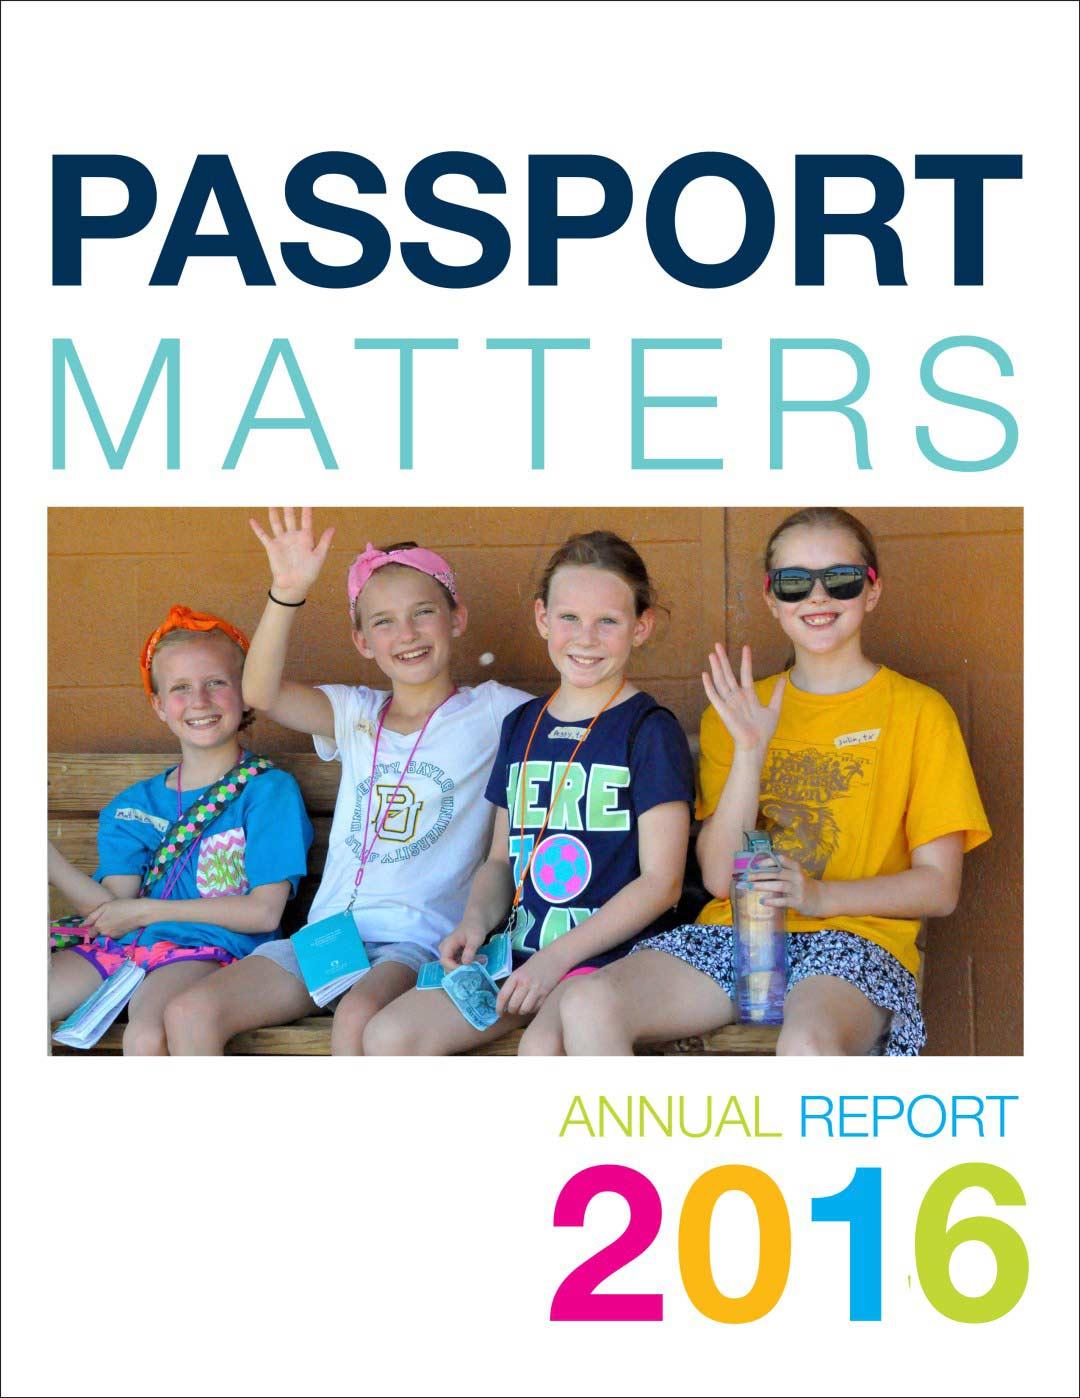 PASSPORT 2014 Annual Report